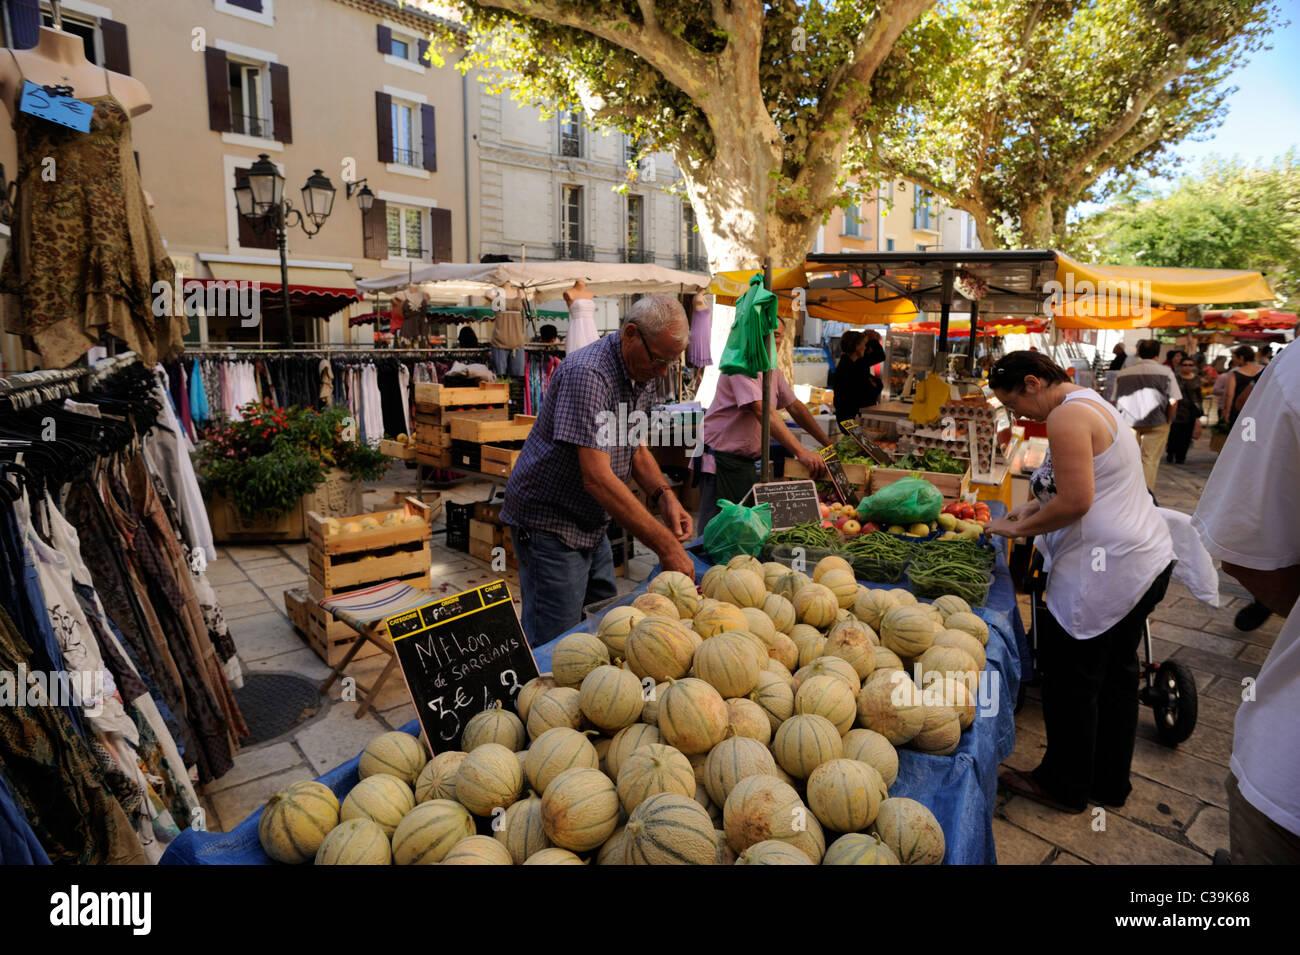 france, provence, vaucluse, orange, outdoor market stall - Stock Image